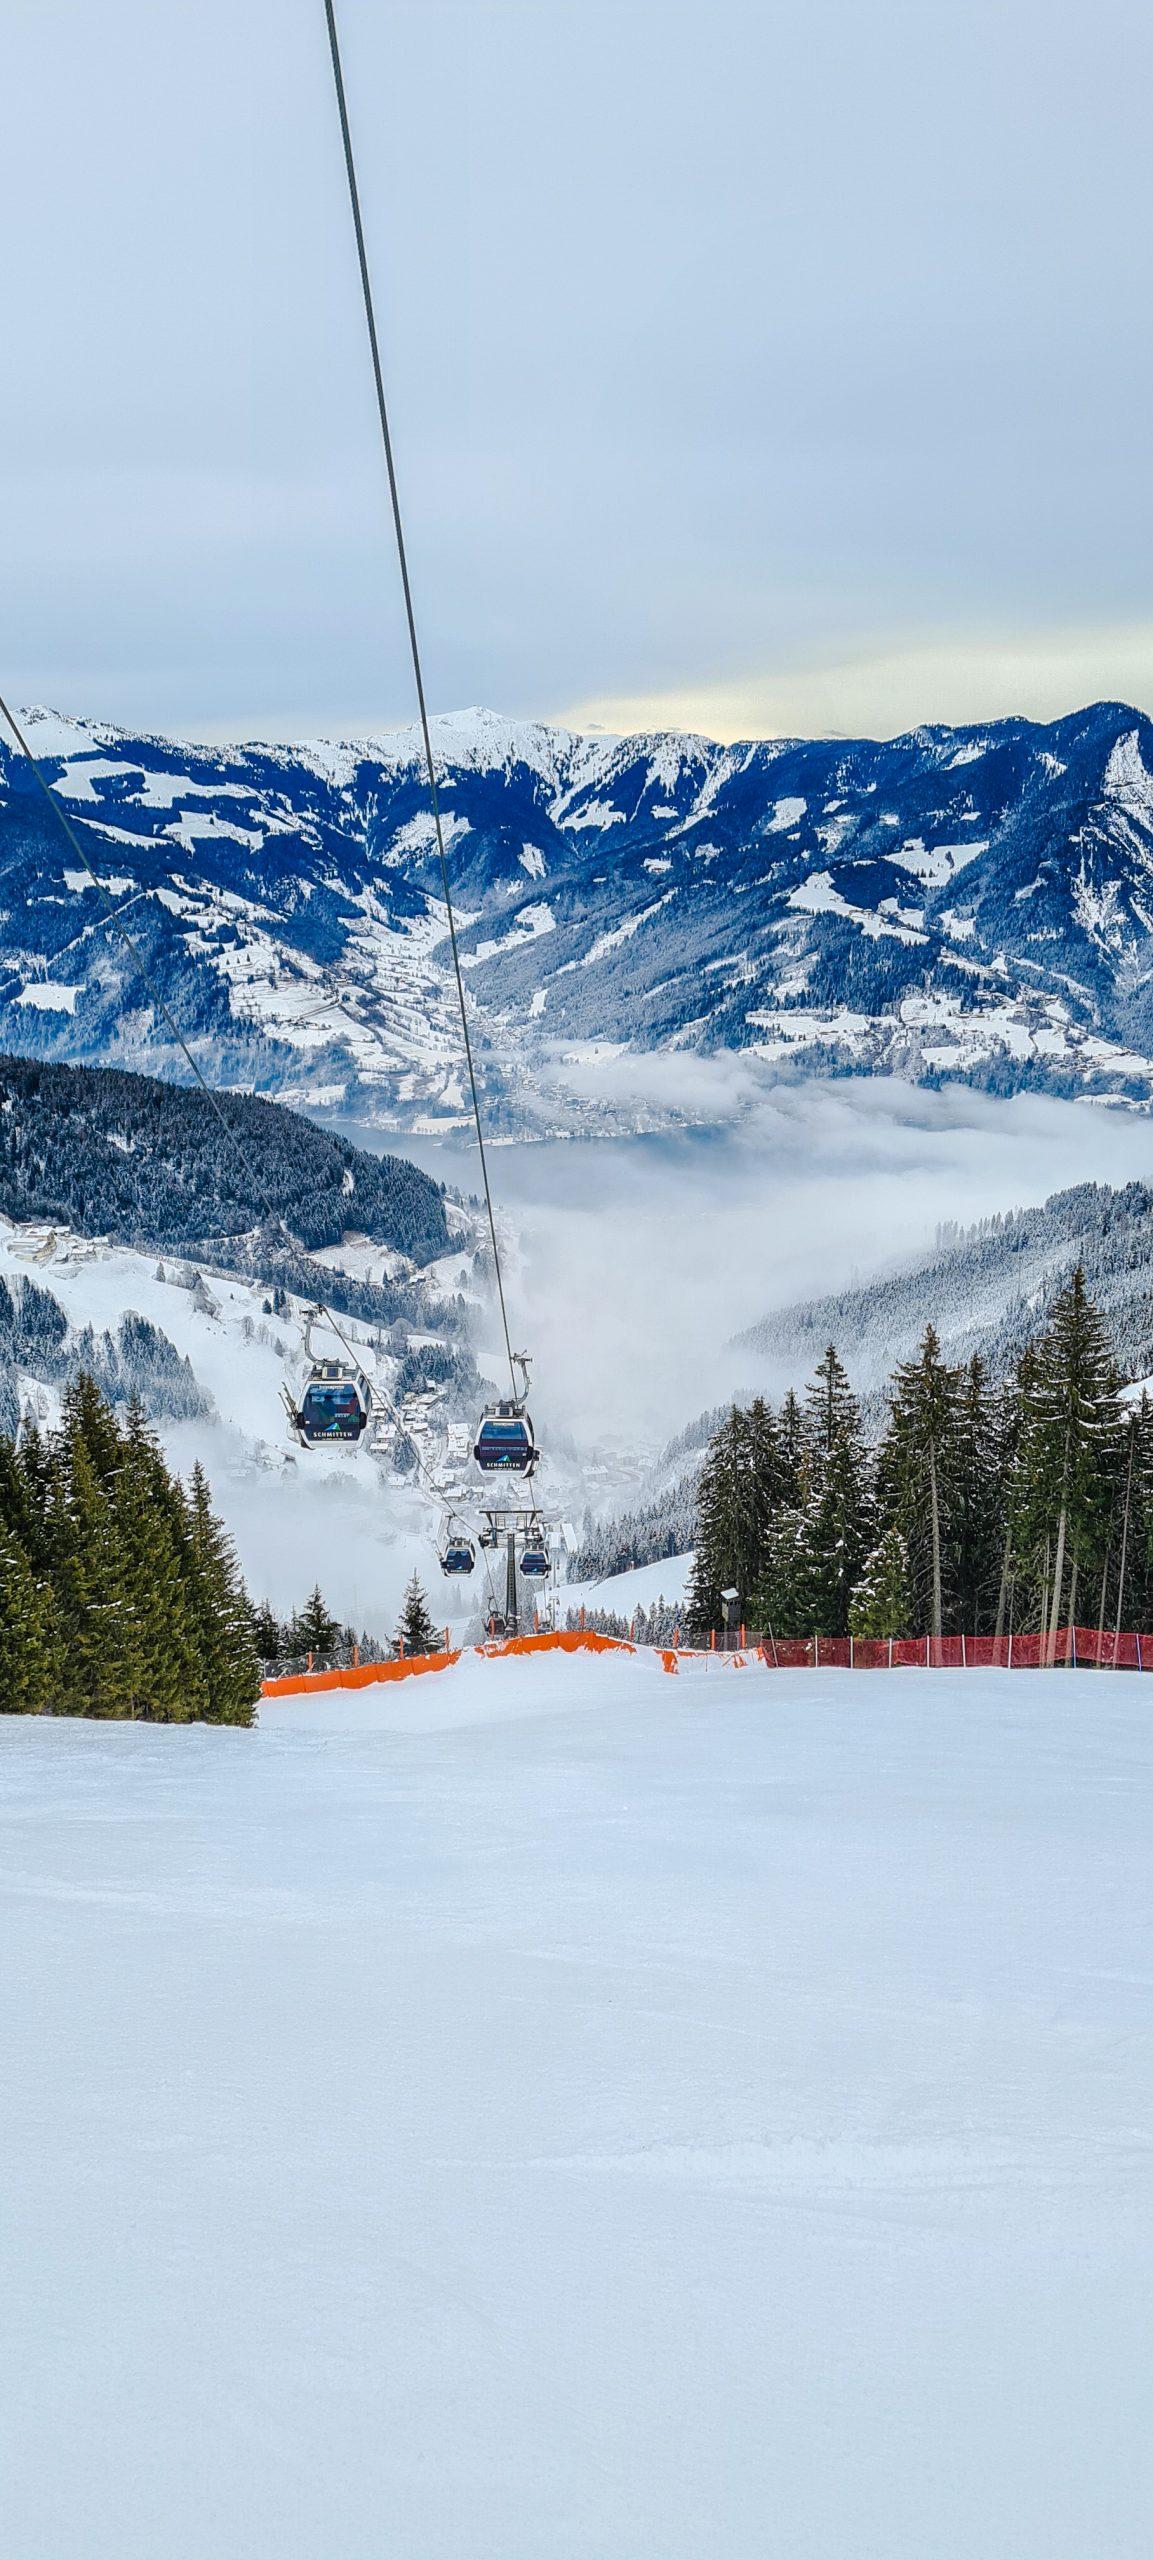 Skiën tijdens de lockdown in Zell am See - Kaprun